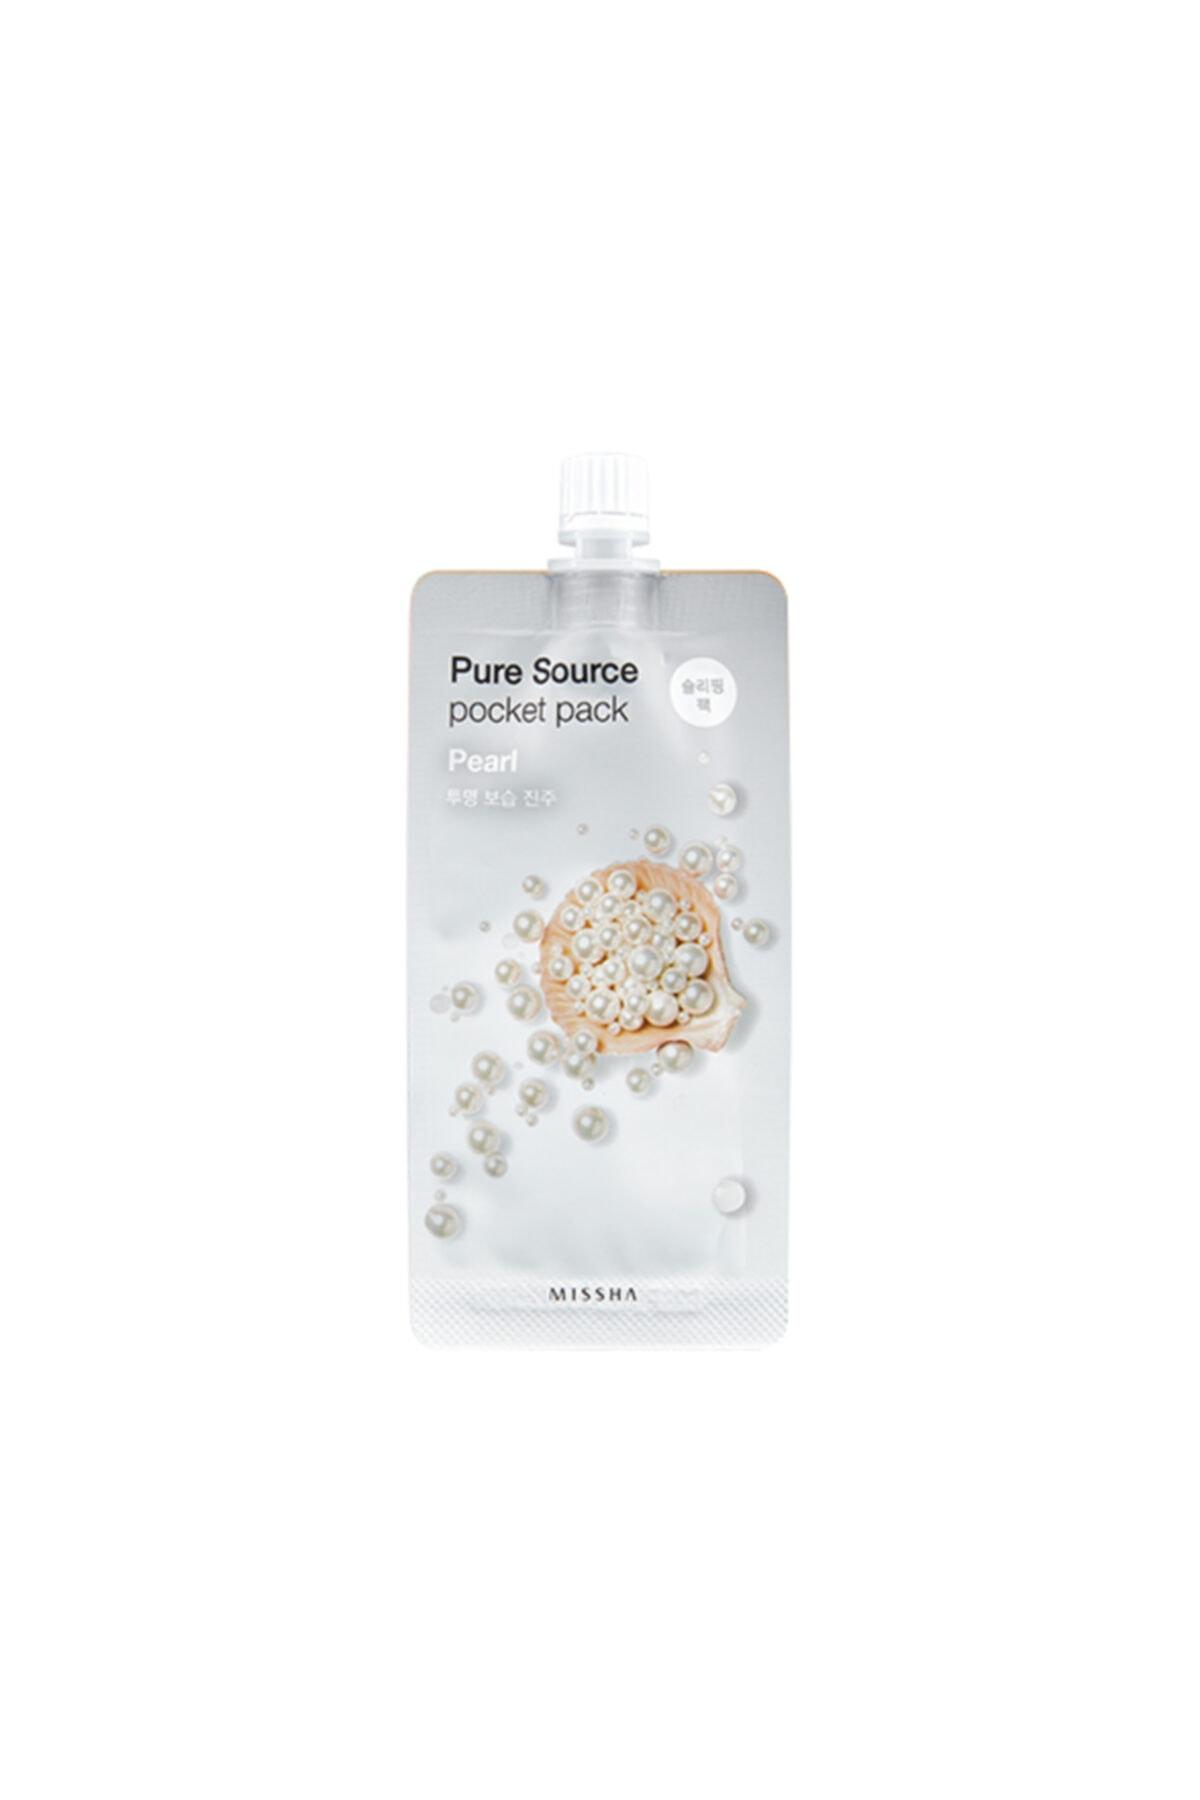 Missha Pure Source Pocket Pack (Pearl) 1